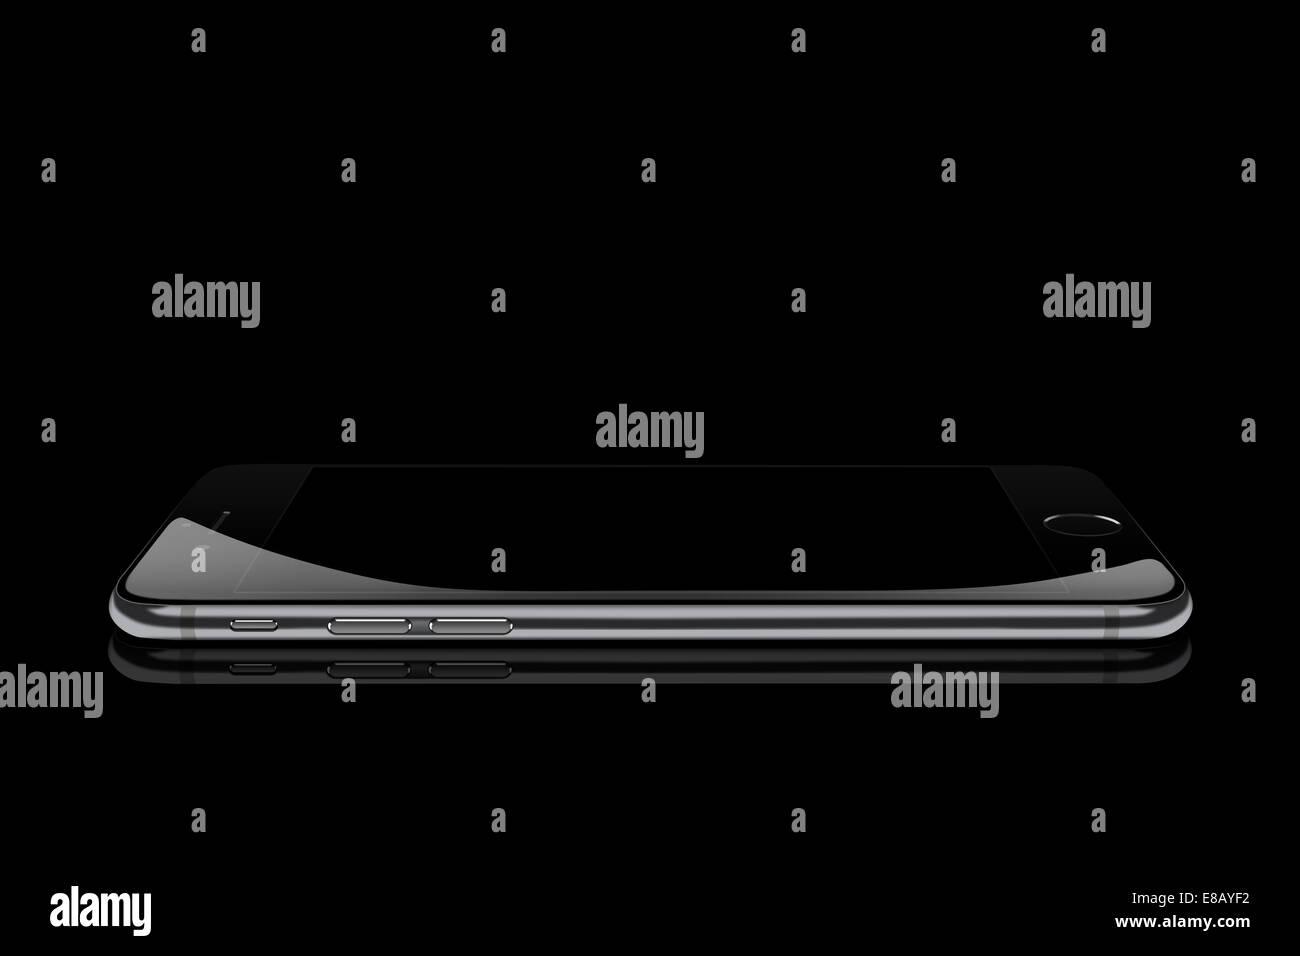 Smart phone iphone 6 space gray, digitally generated artwork. - Stock Image